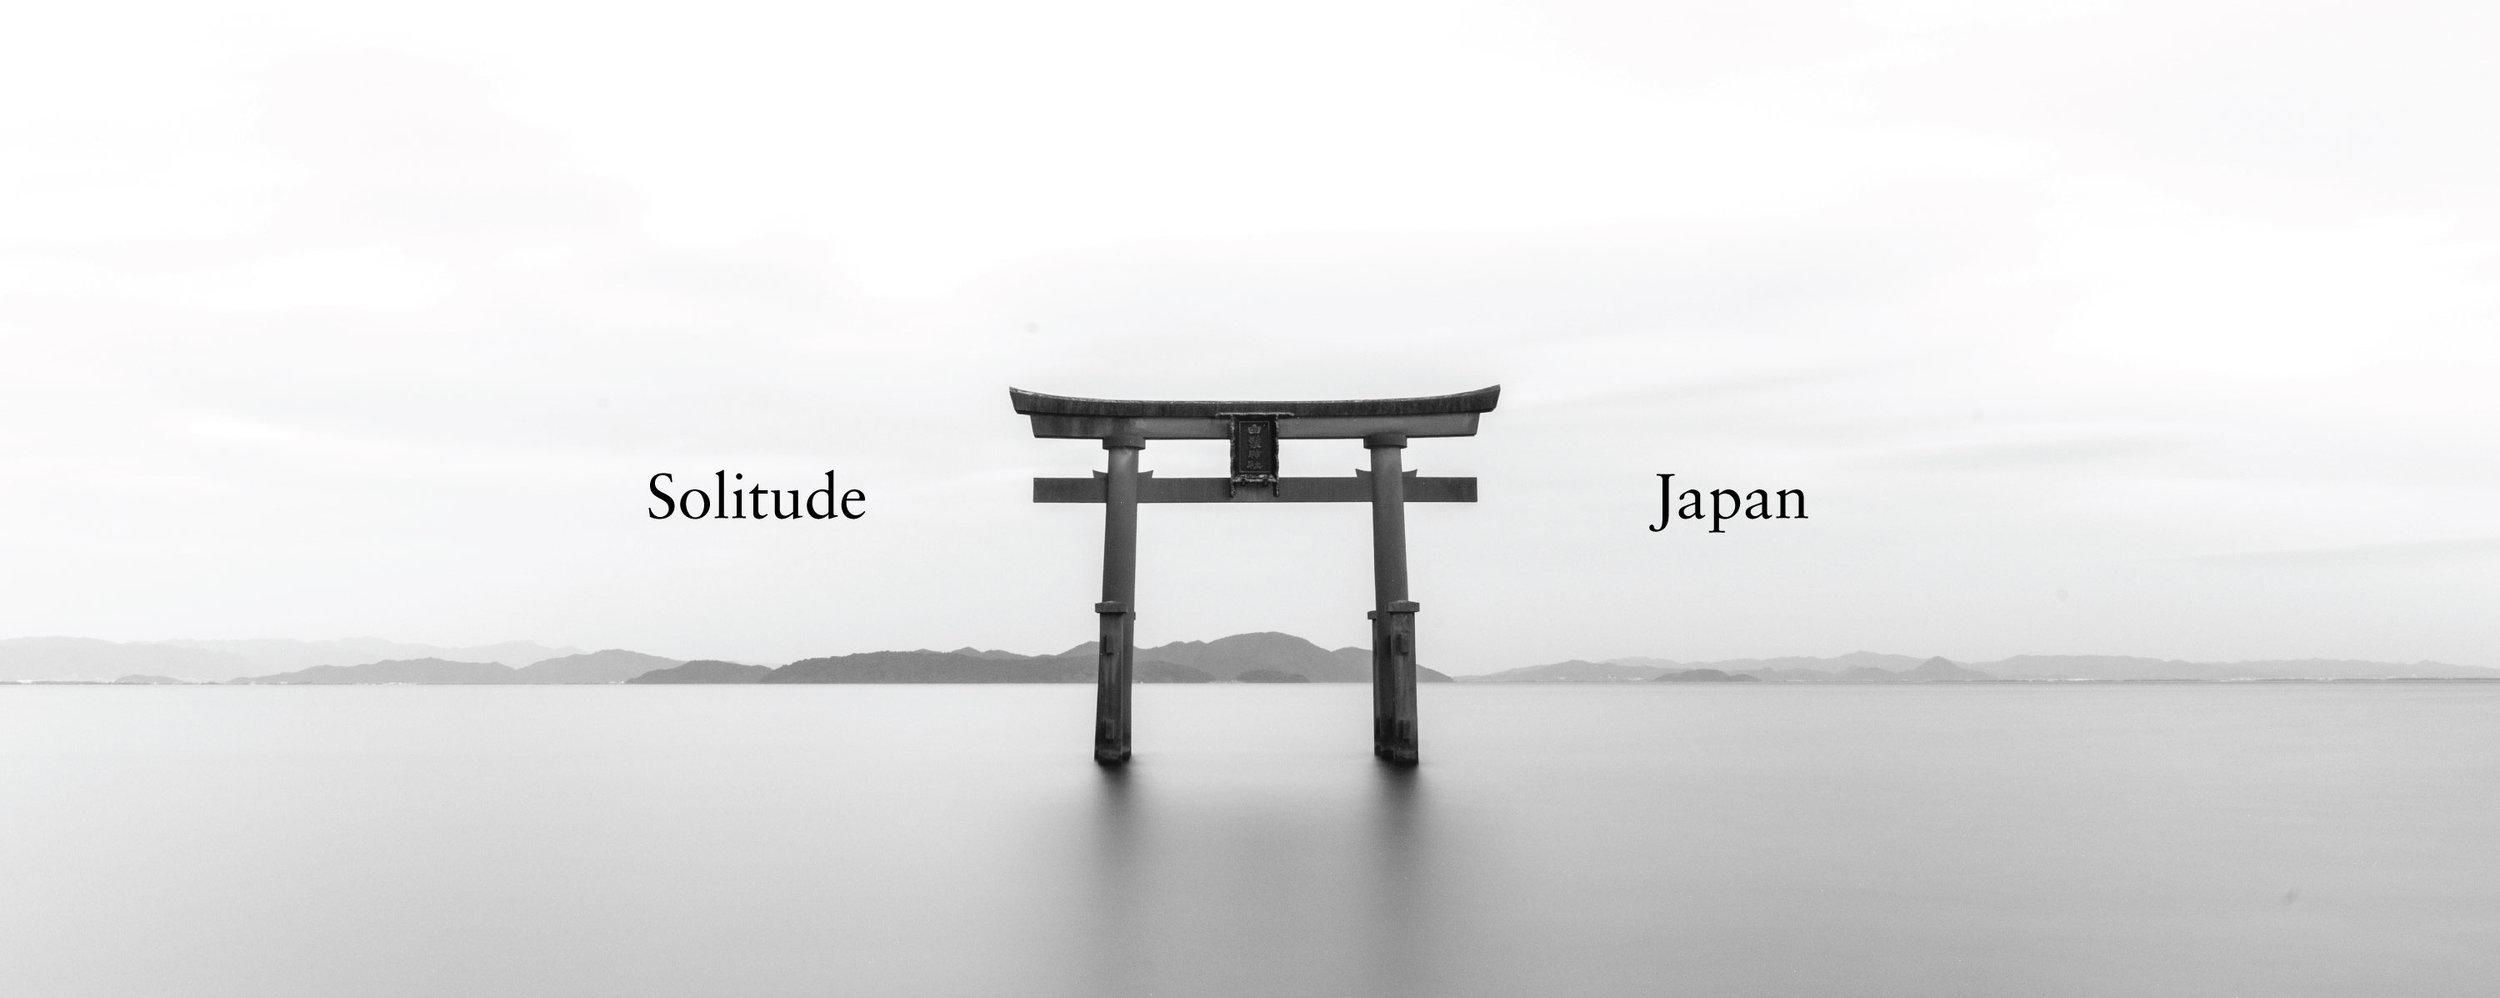 JapanSolitude.jpg